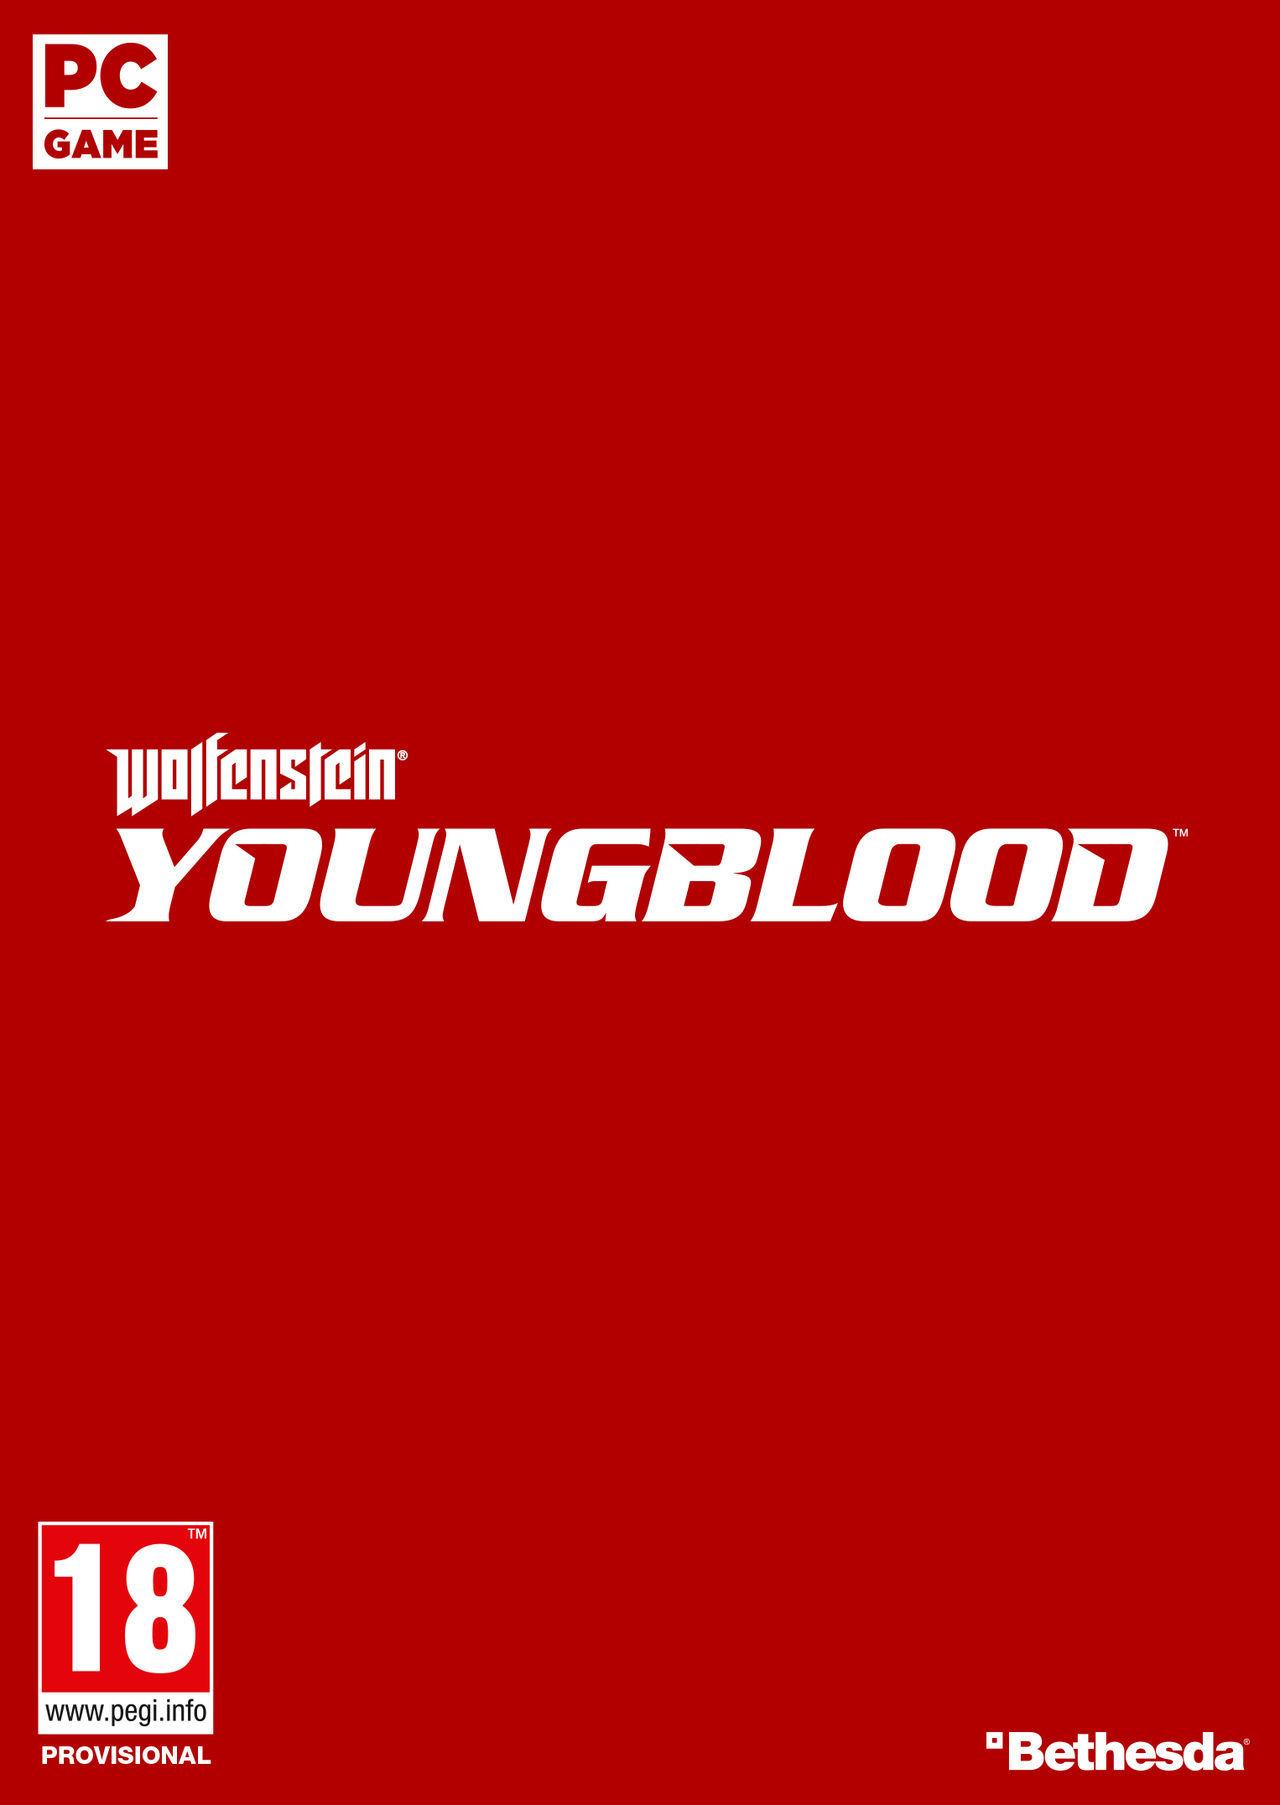 Imagen 1 de Wolfenstein Youngblood para Ordenador